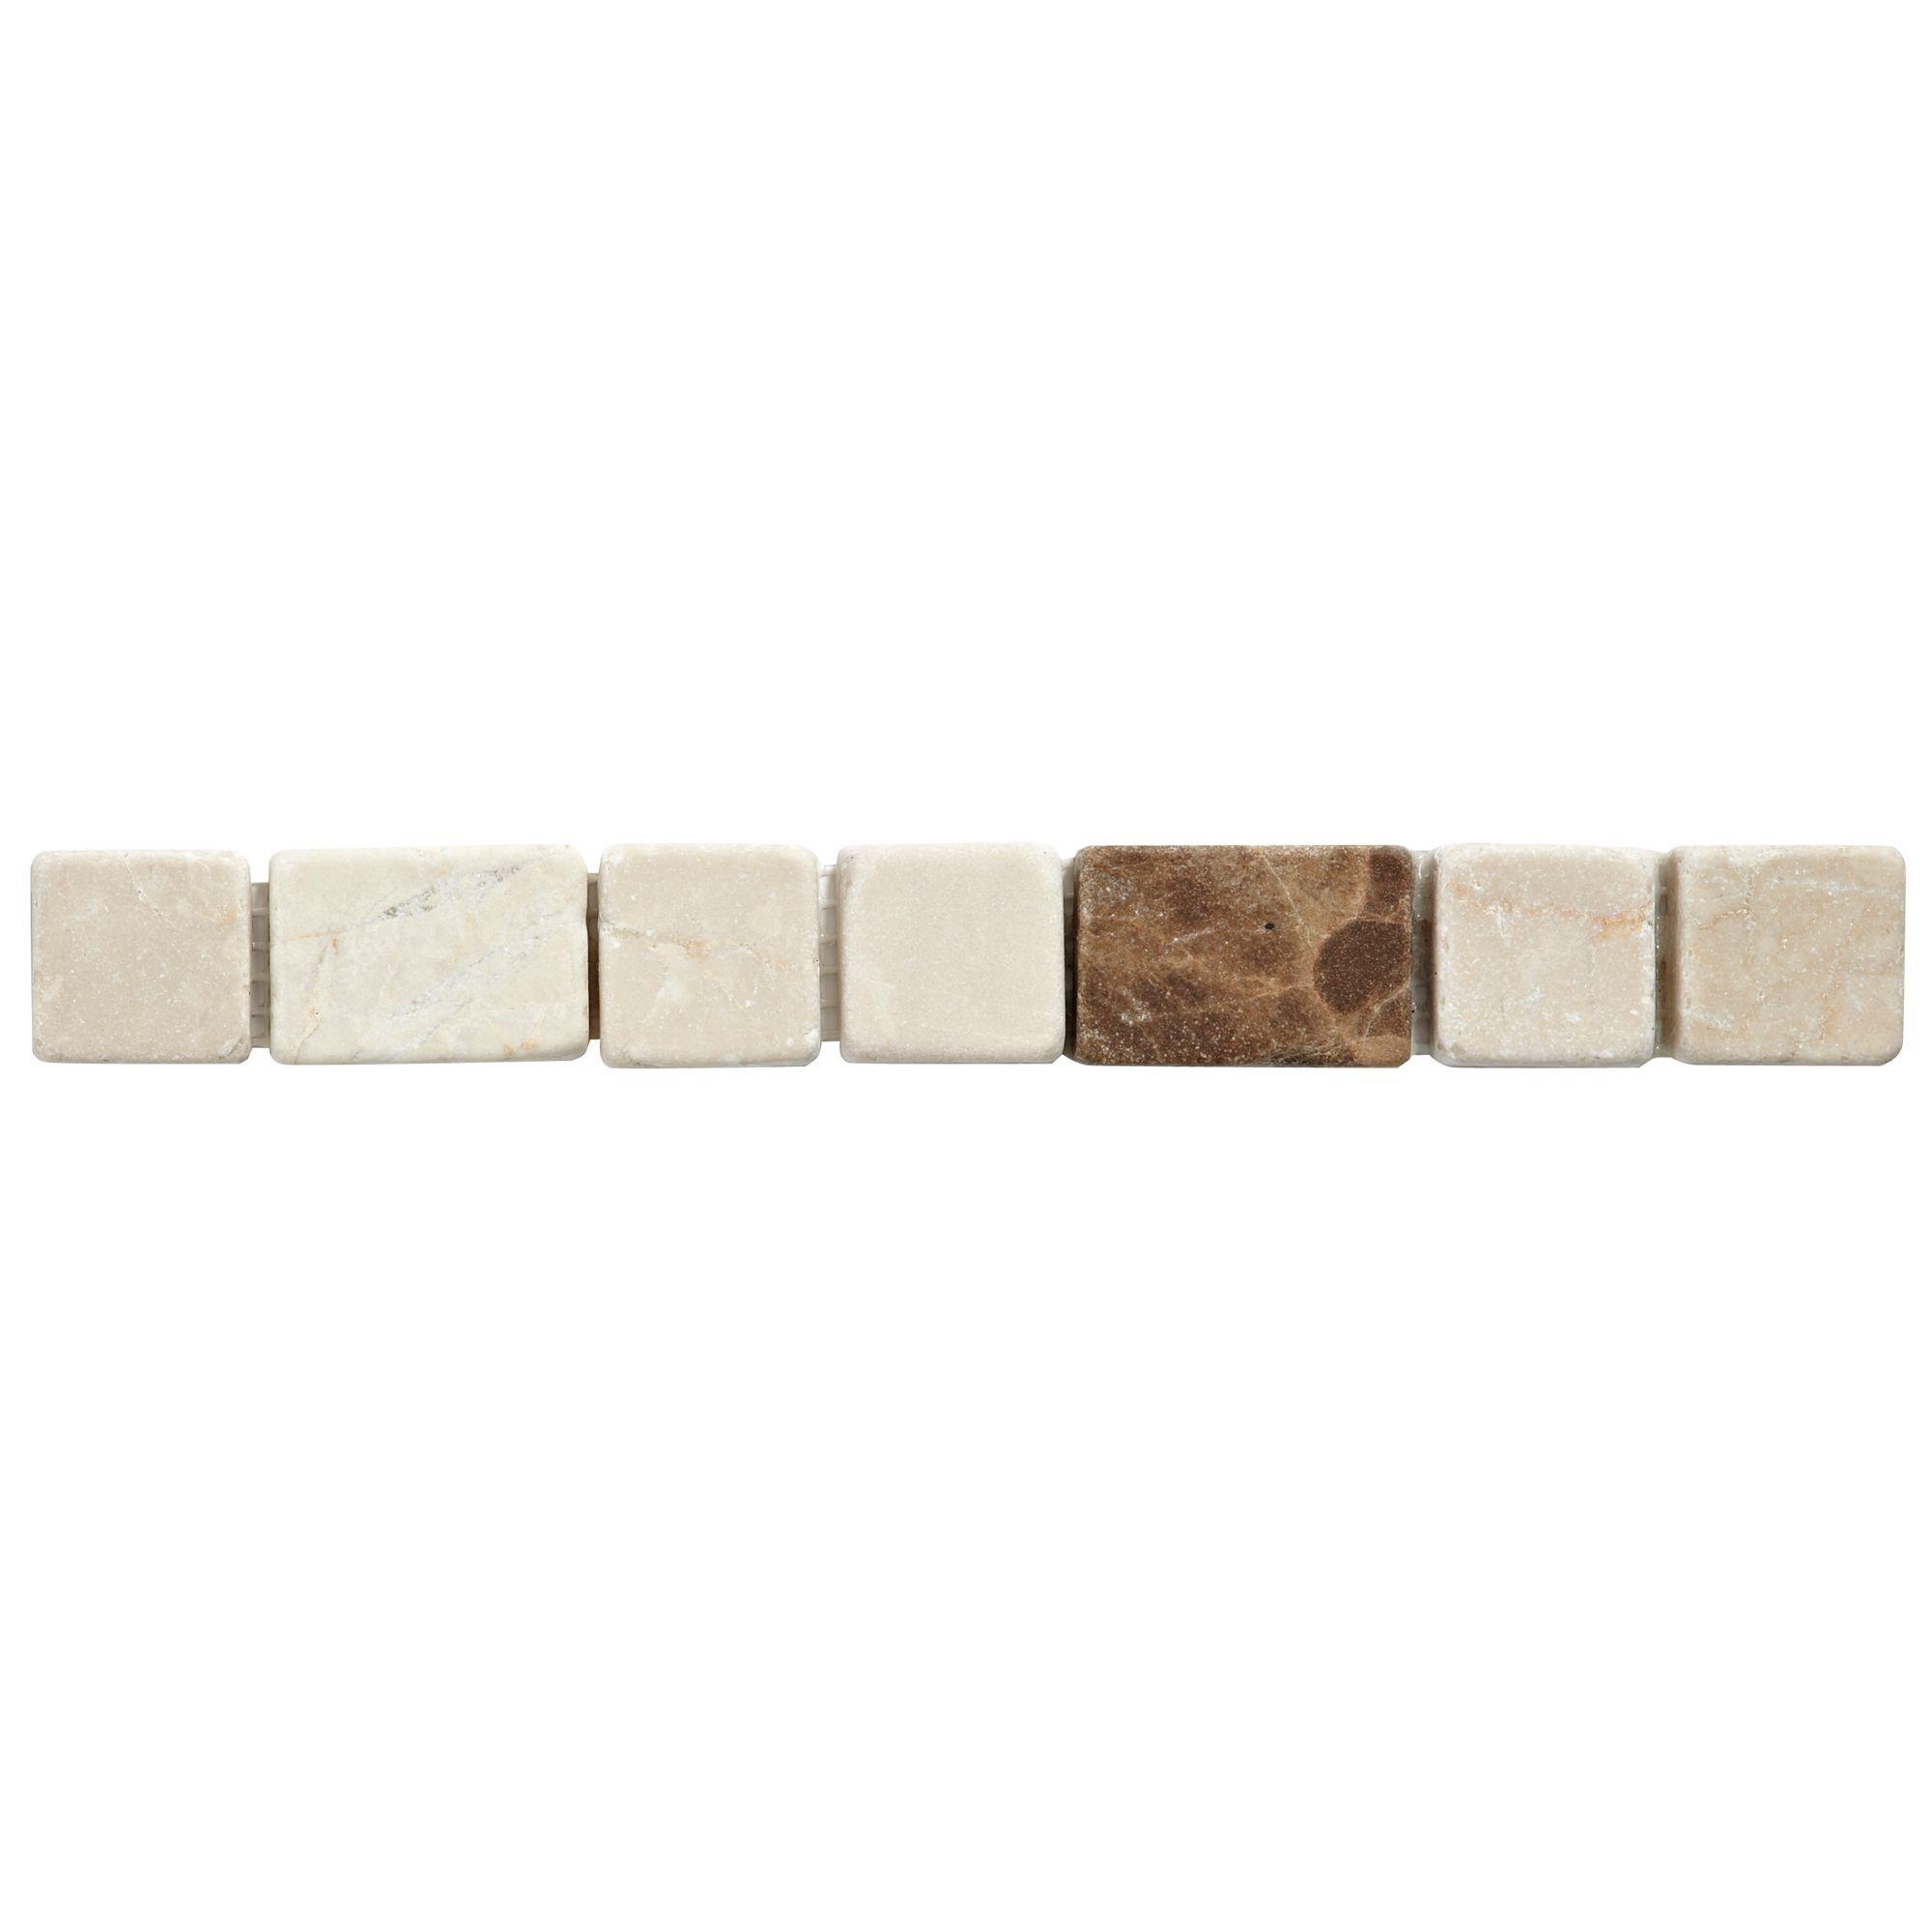 Block Natural Stone Effect Mosaic Border Tile, (l)250mm (w)30mm